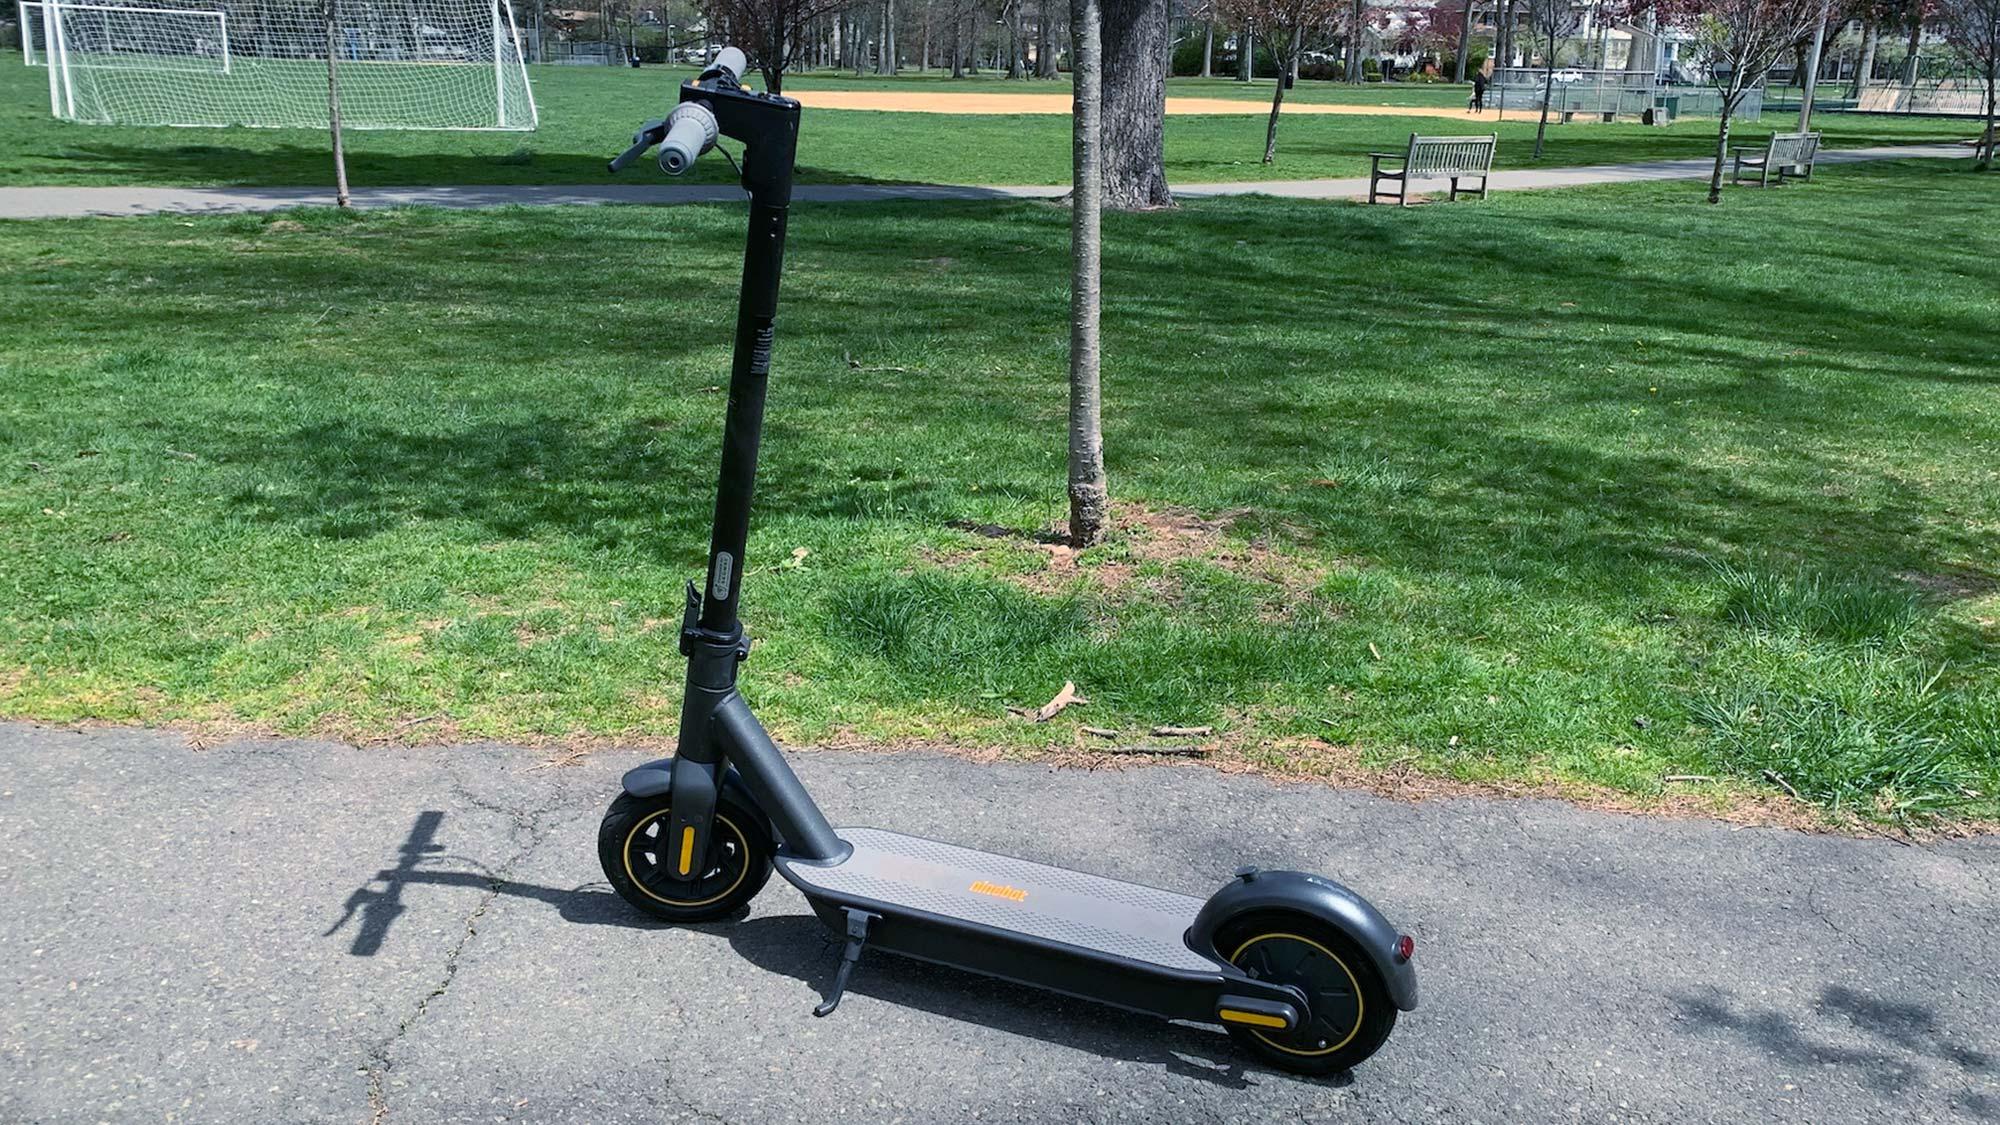 melhores scooters elétricas: Segway Ninebot Kickscooter Max